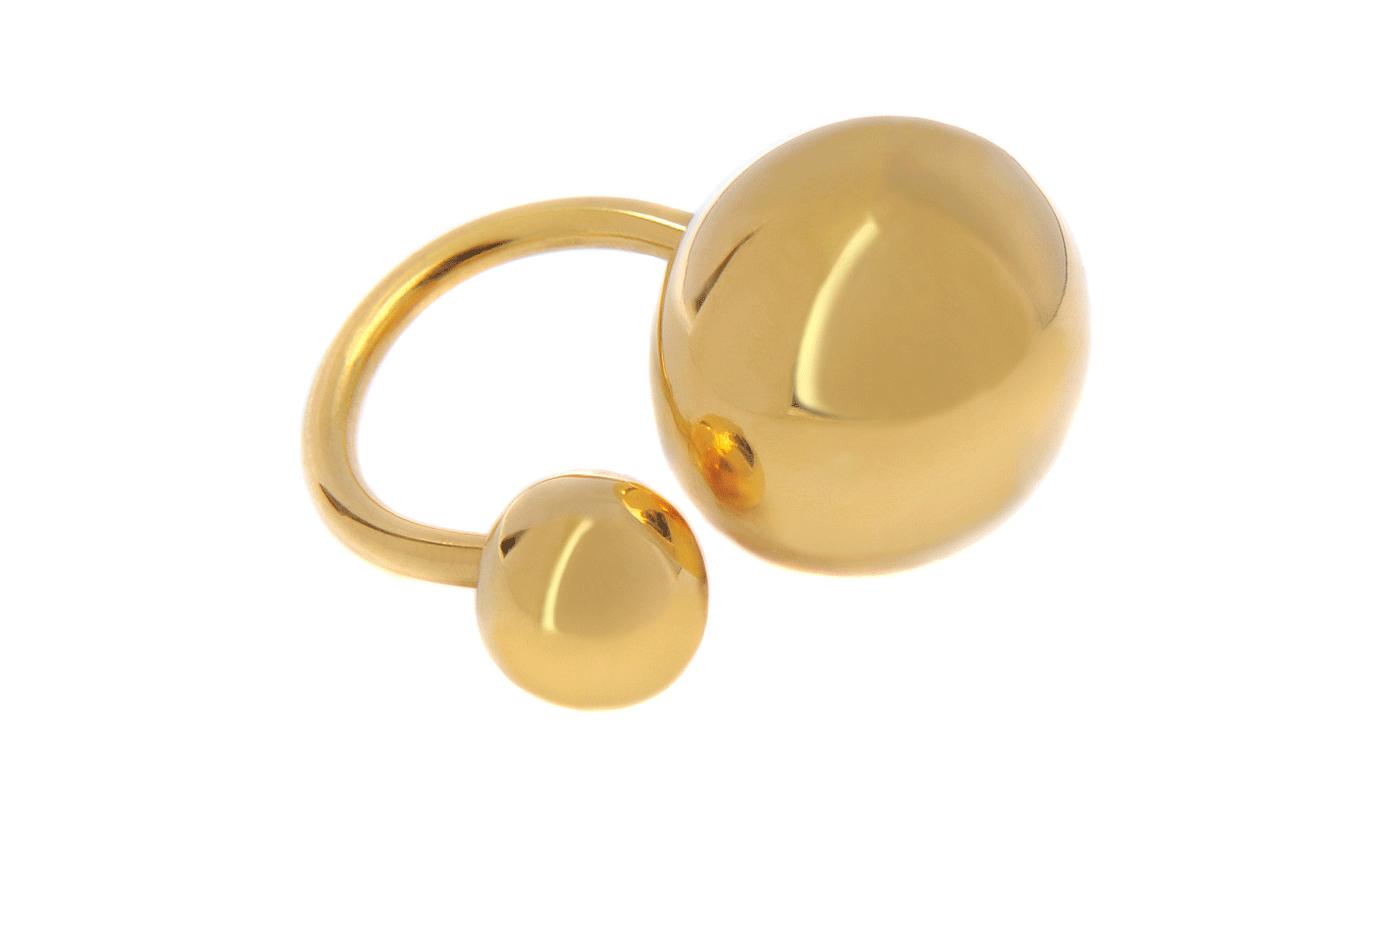 Adeline Cacheux Jewelry Design Bague plaqué or